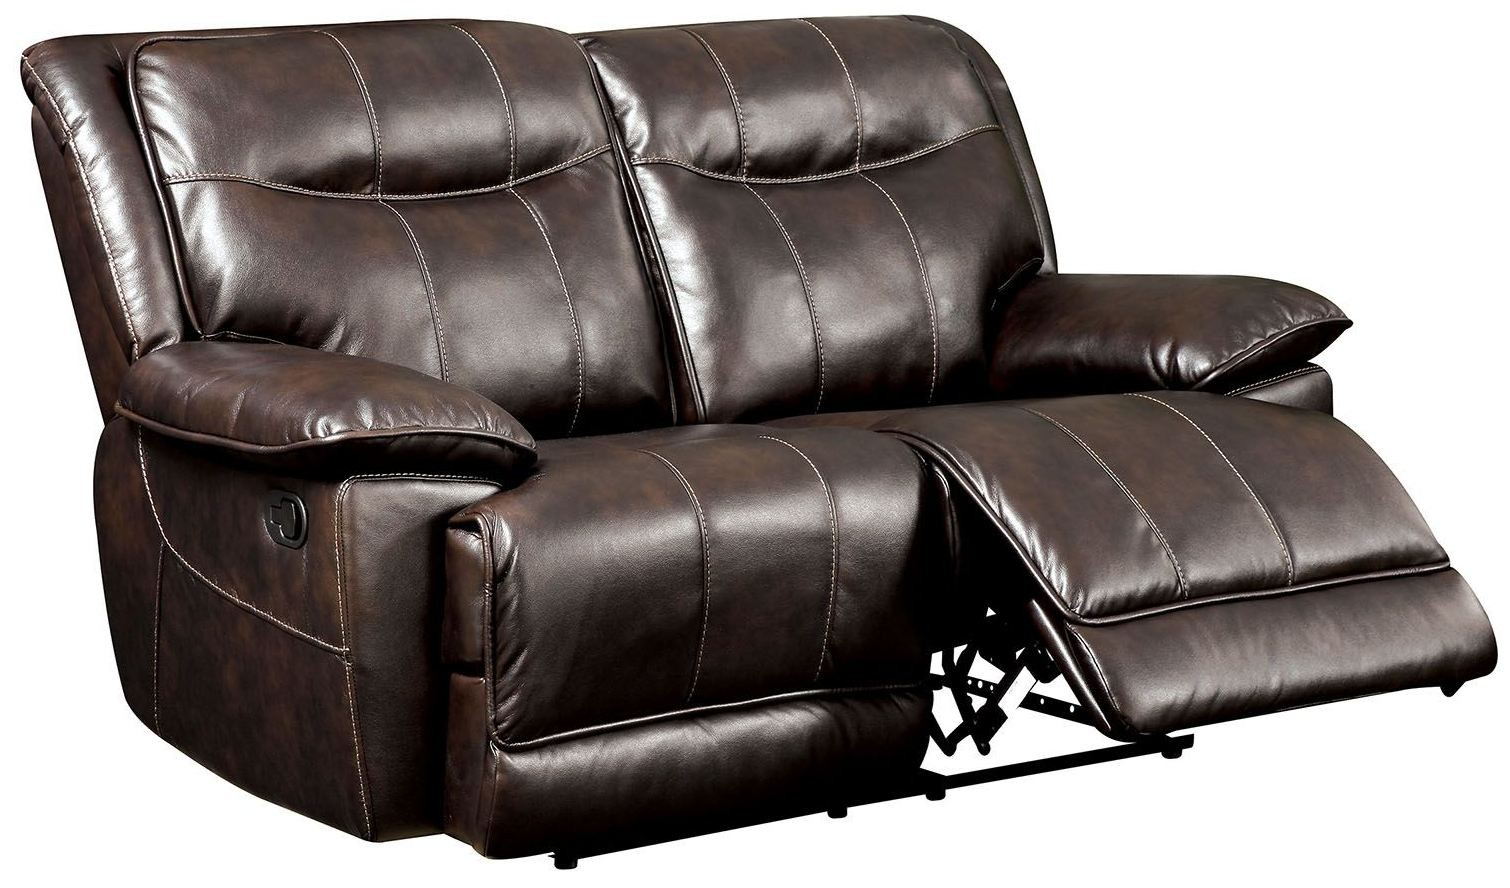 Dolton Brown Reclining Loveseat Cm6128br Lv Furniture Of America